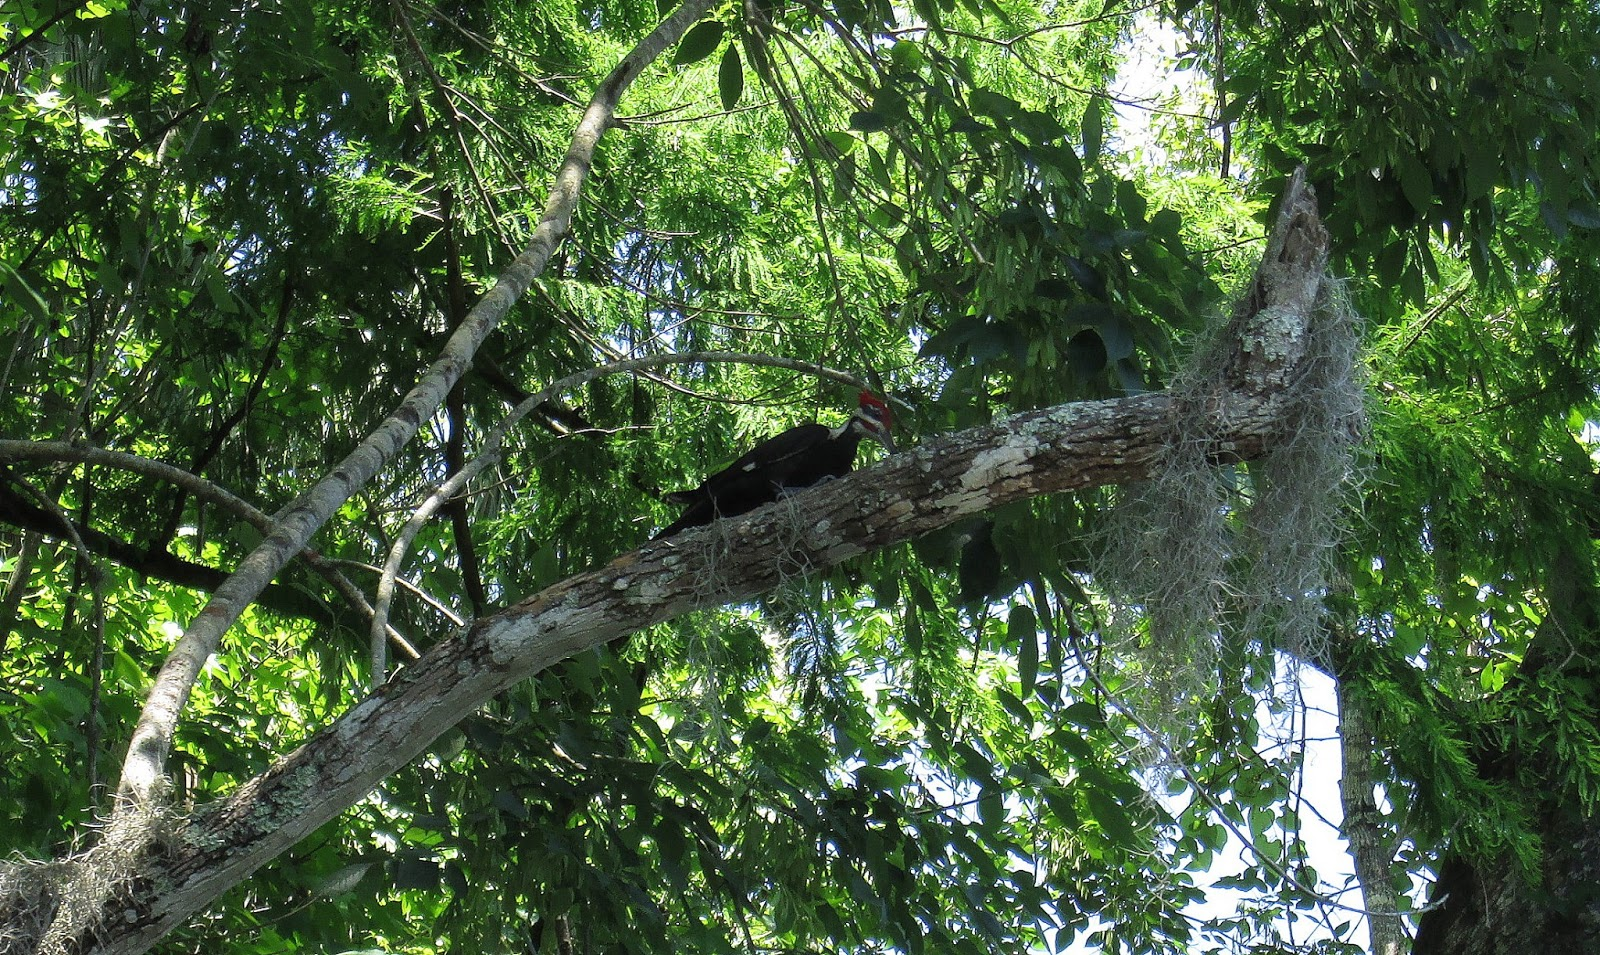 Wekiva River Monkeys Wekiva River This Morning